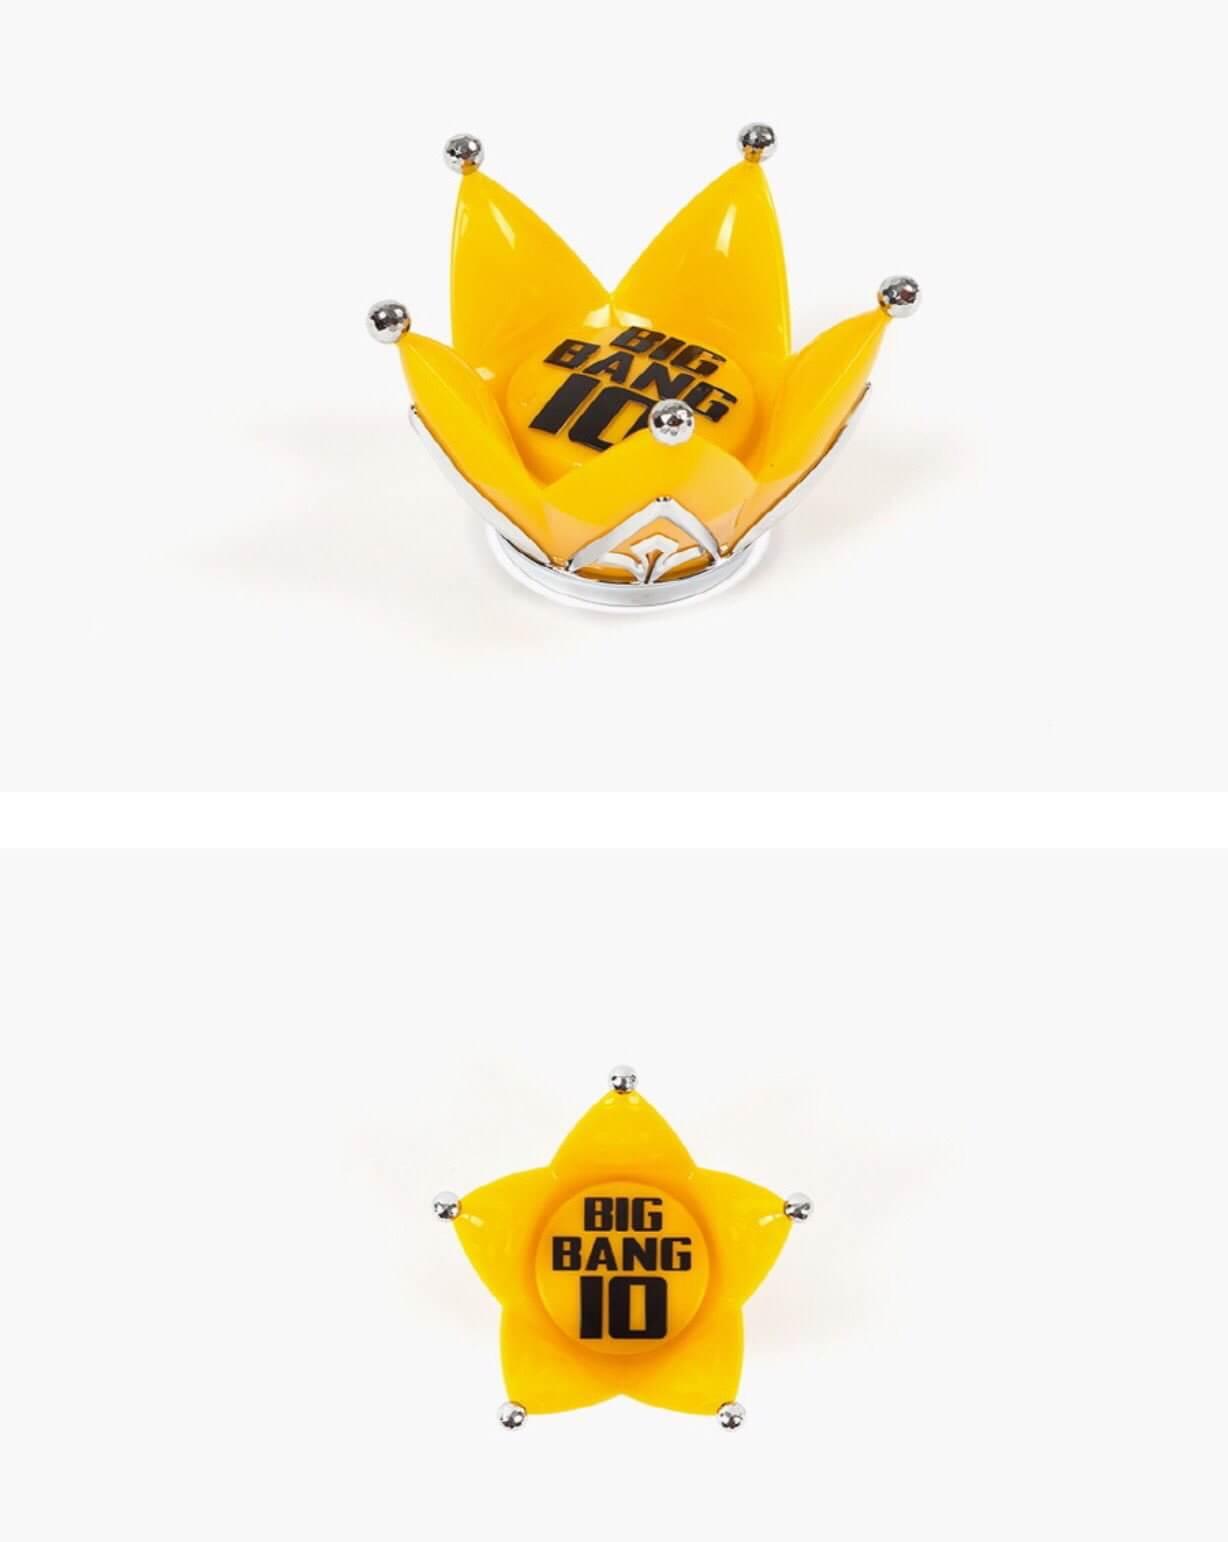 BIGBANG LIGHT STICK HEAD (10ปี)